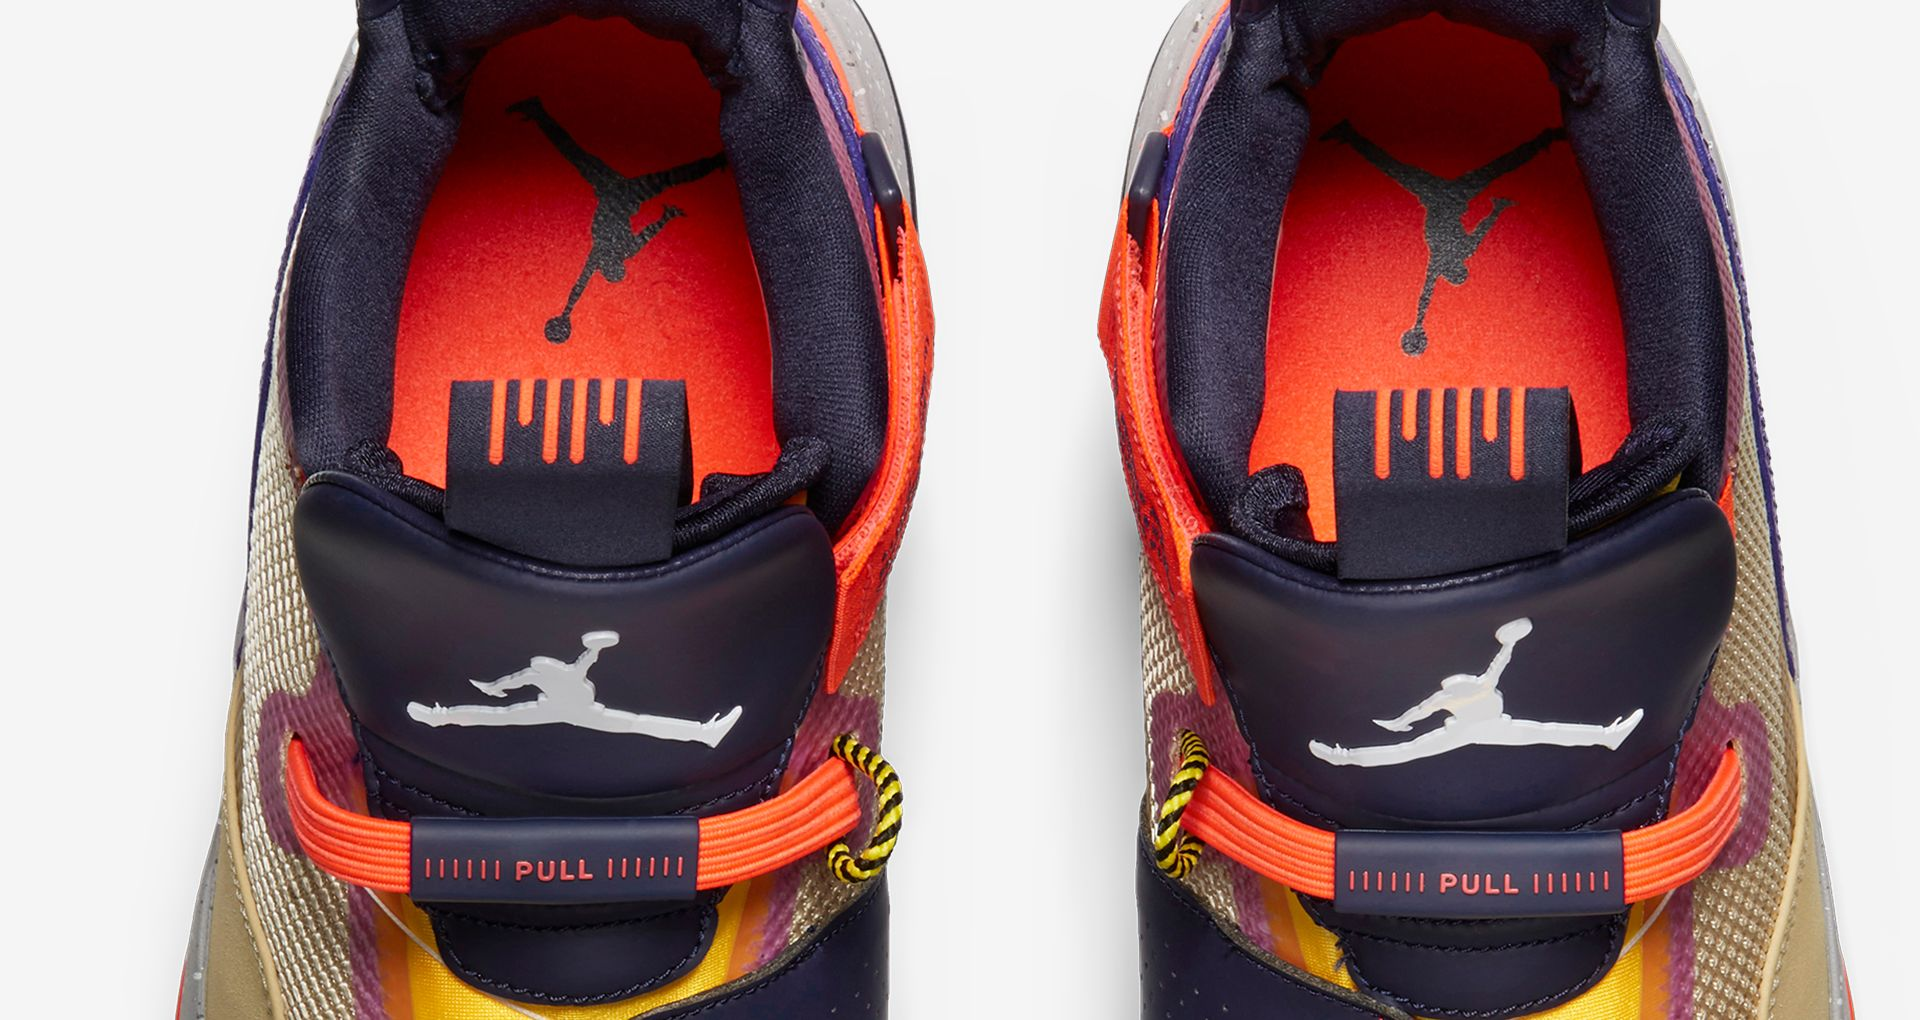 79fe3d76f58 Air Jordan 33  Desert Ore   Black   Dark Concord  Release Date. Nike ...